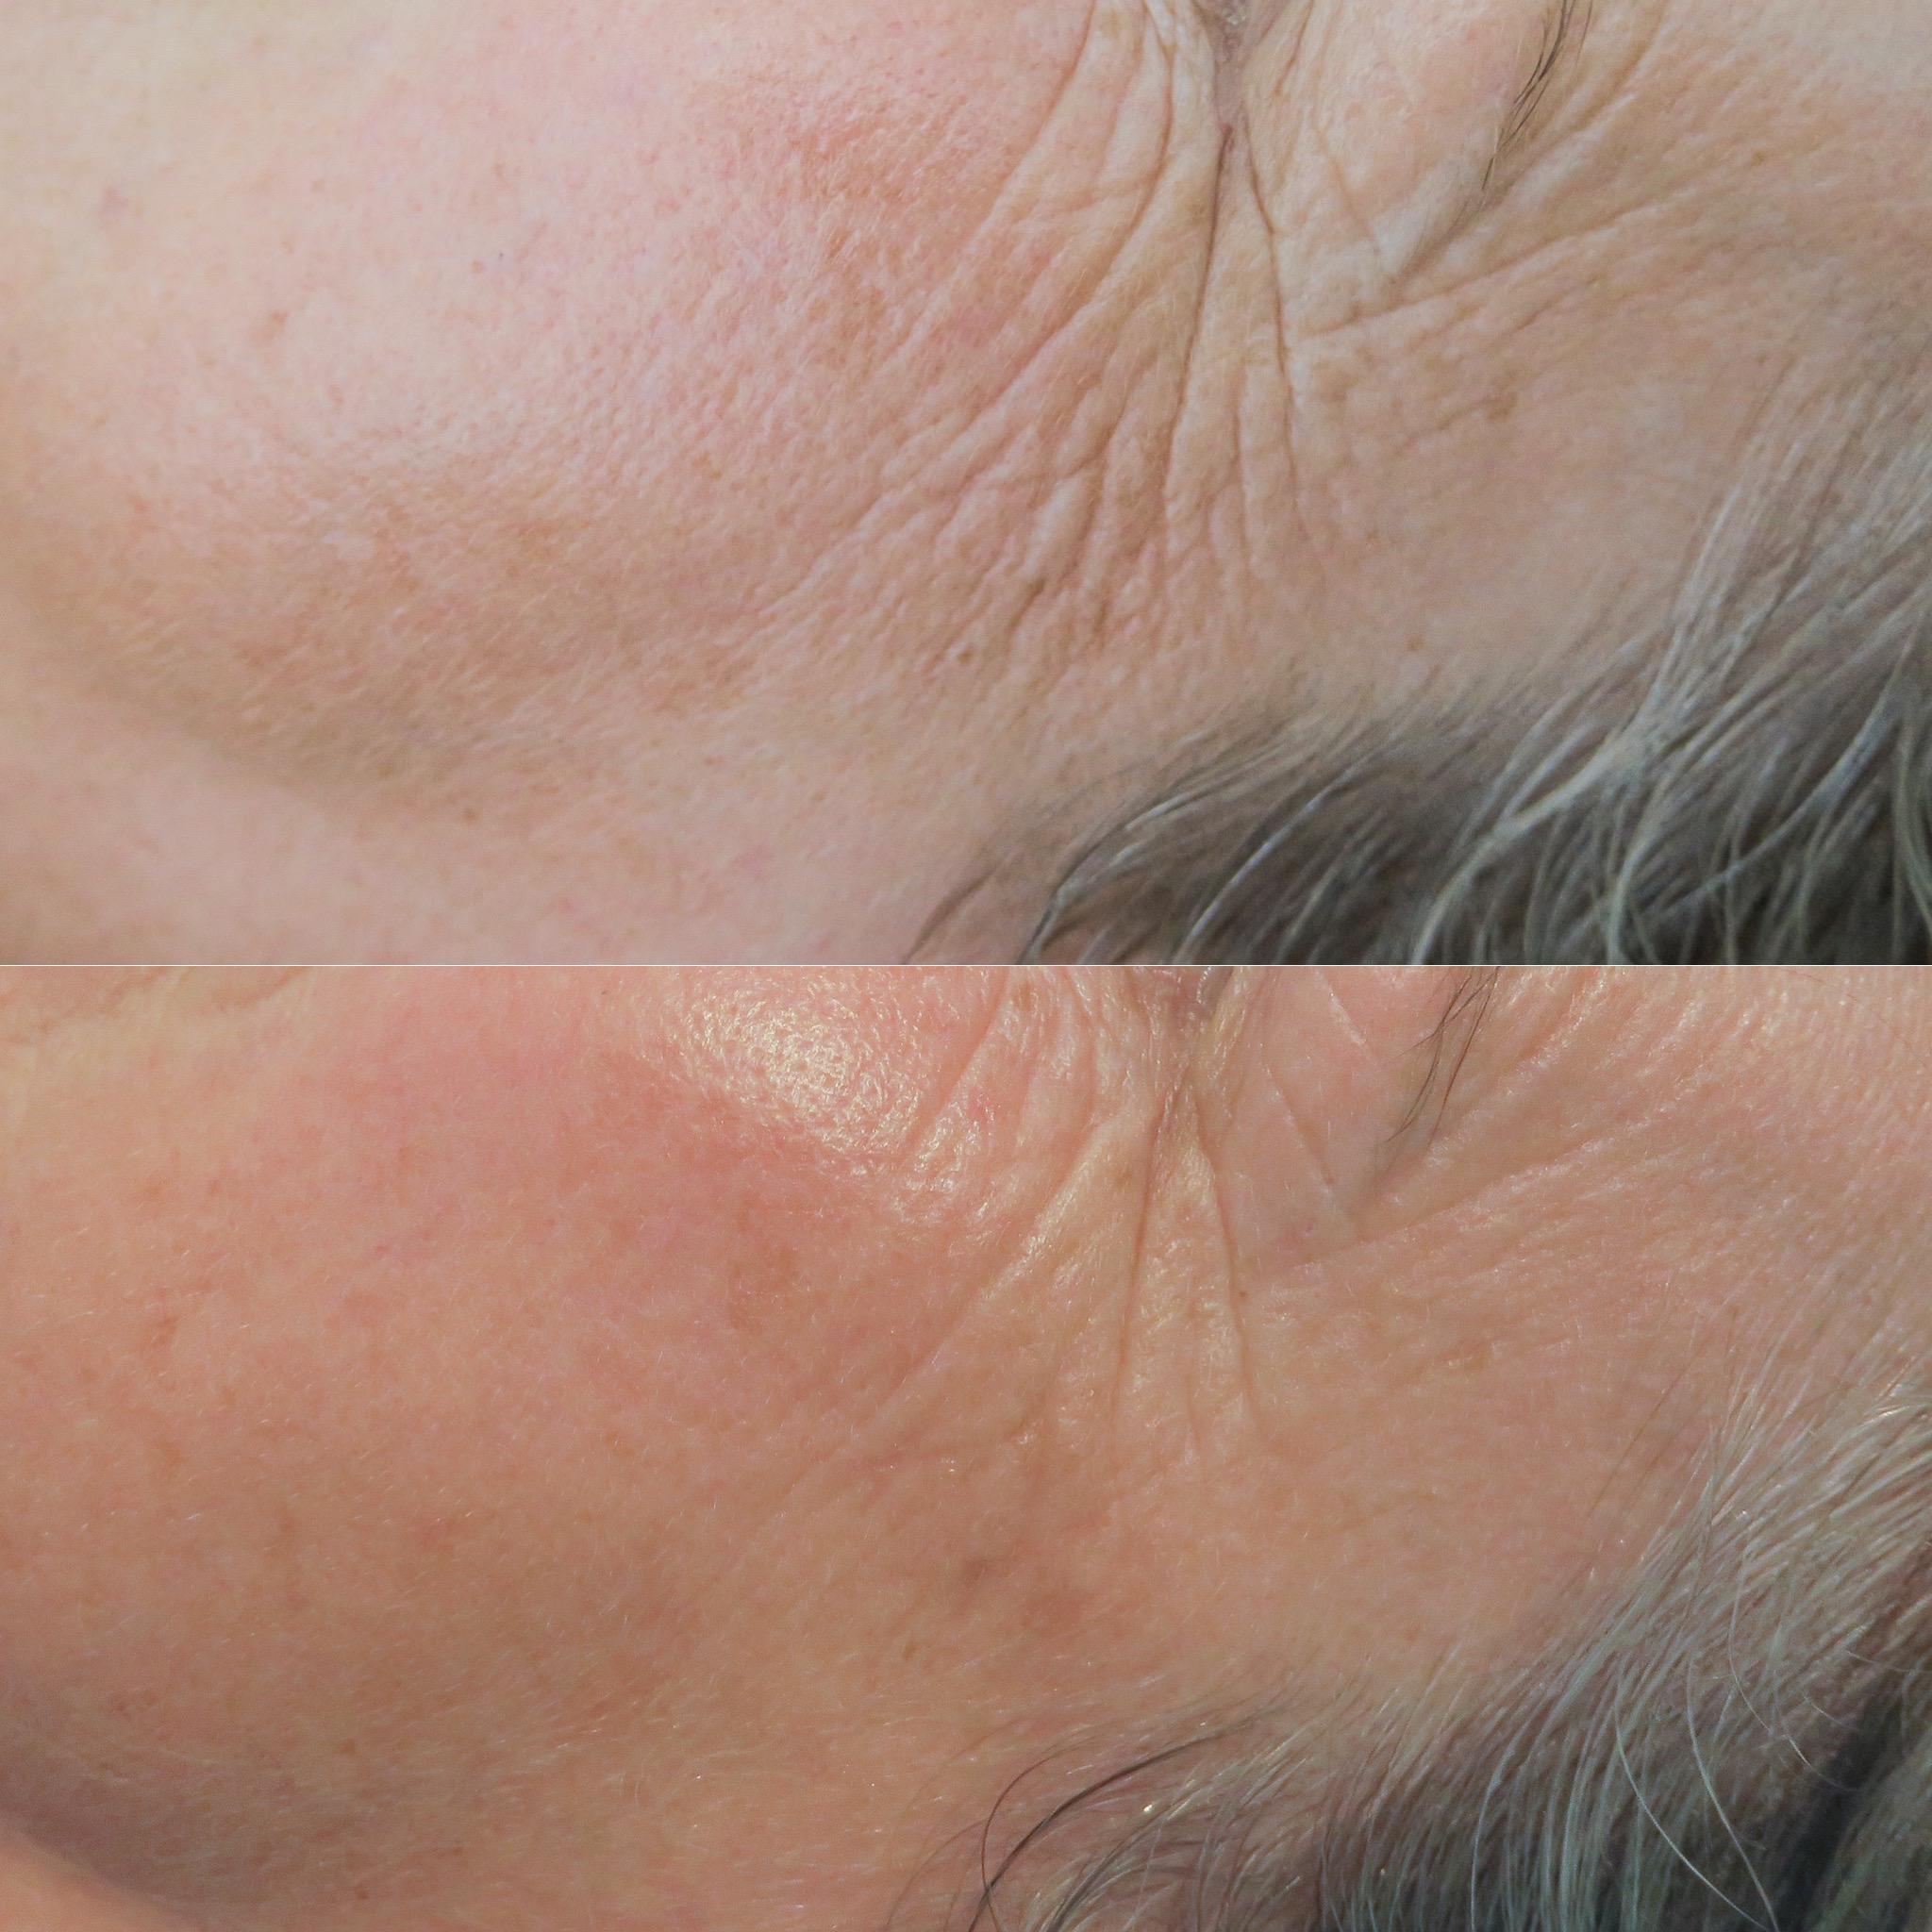 Wrinkles and skin health